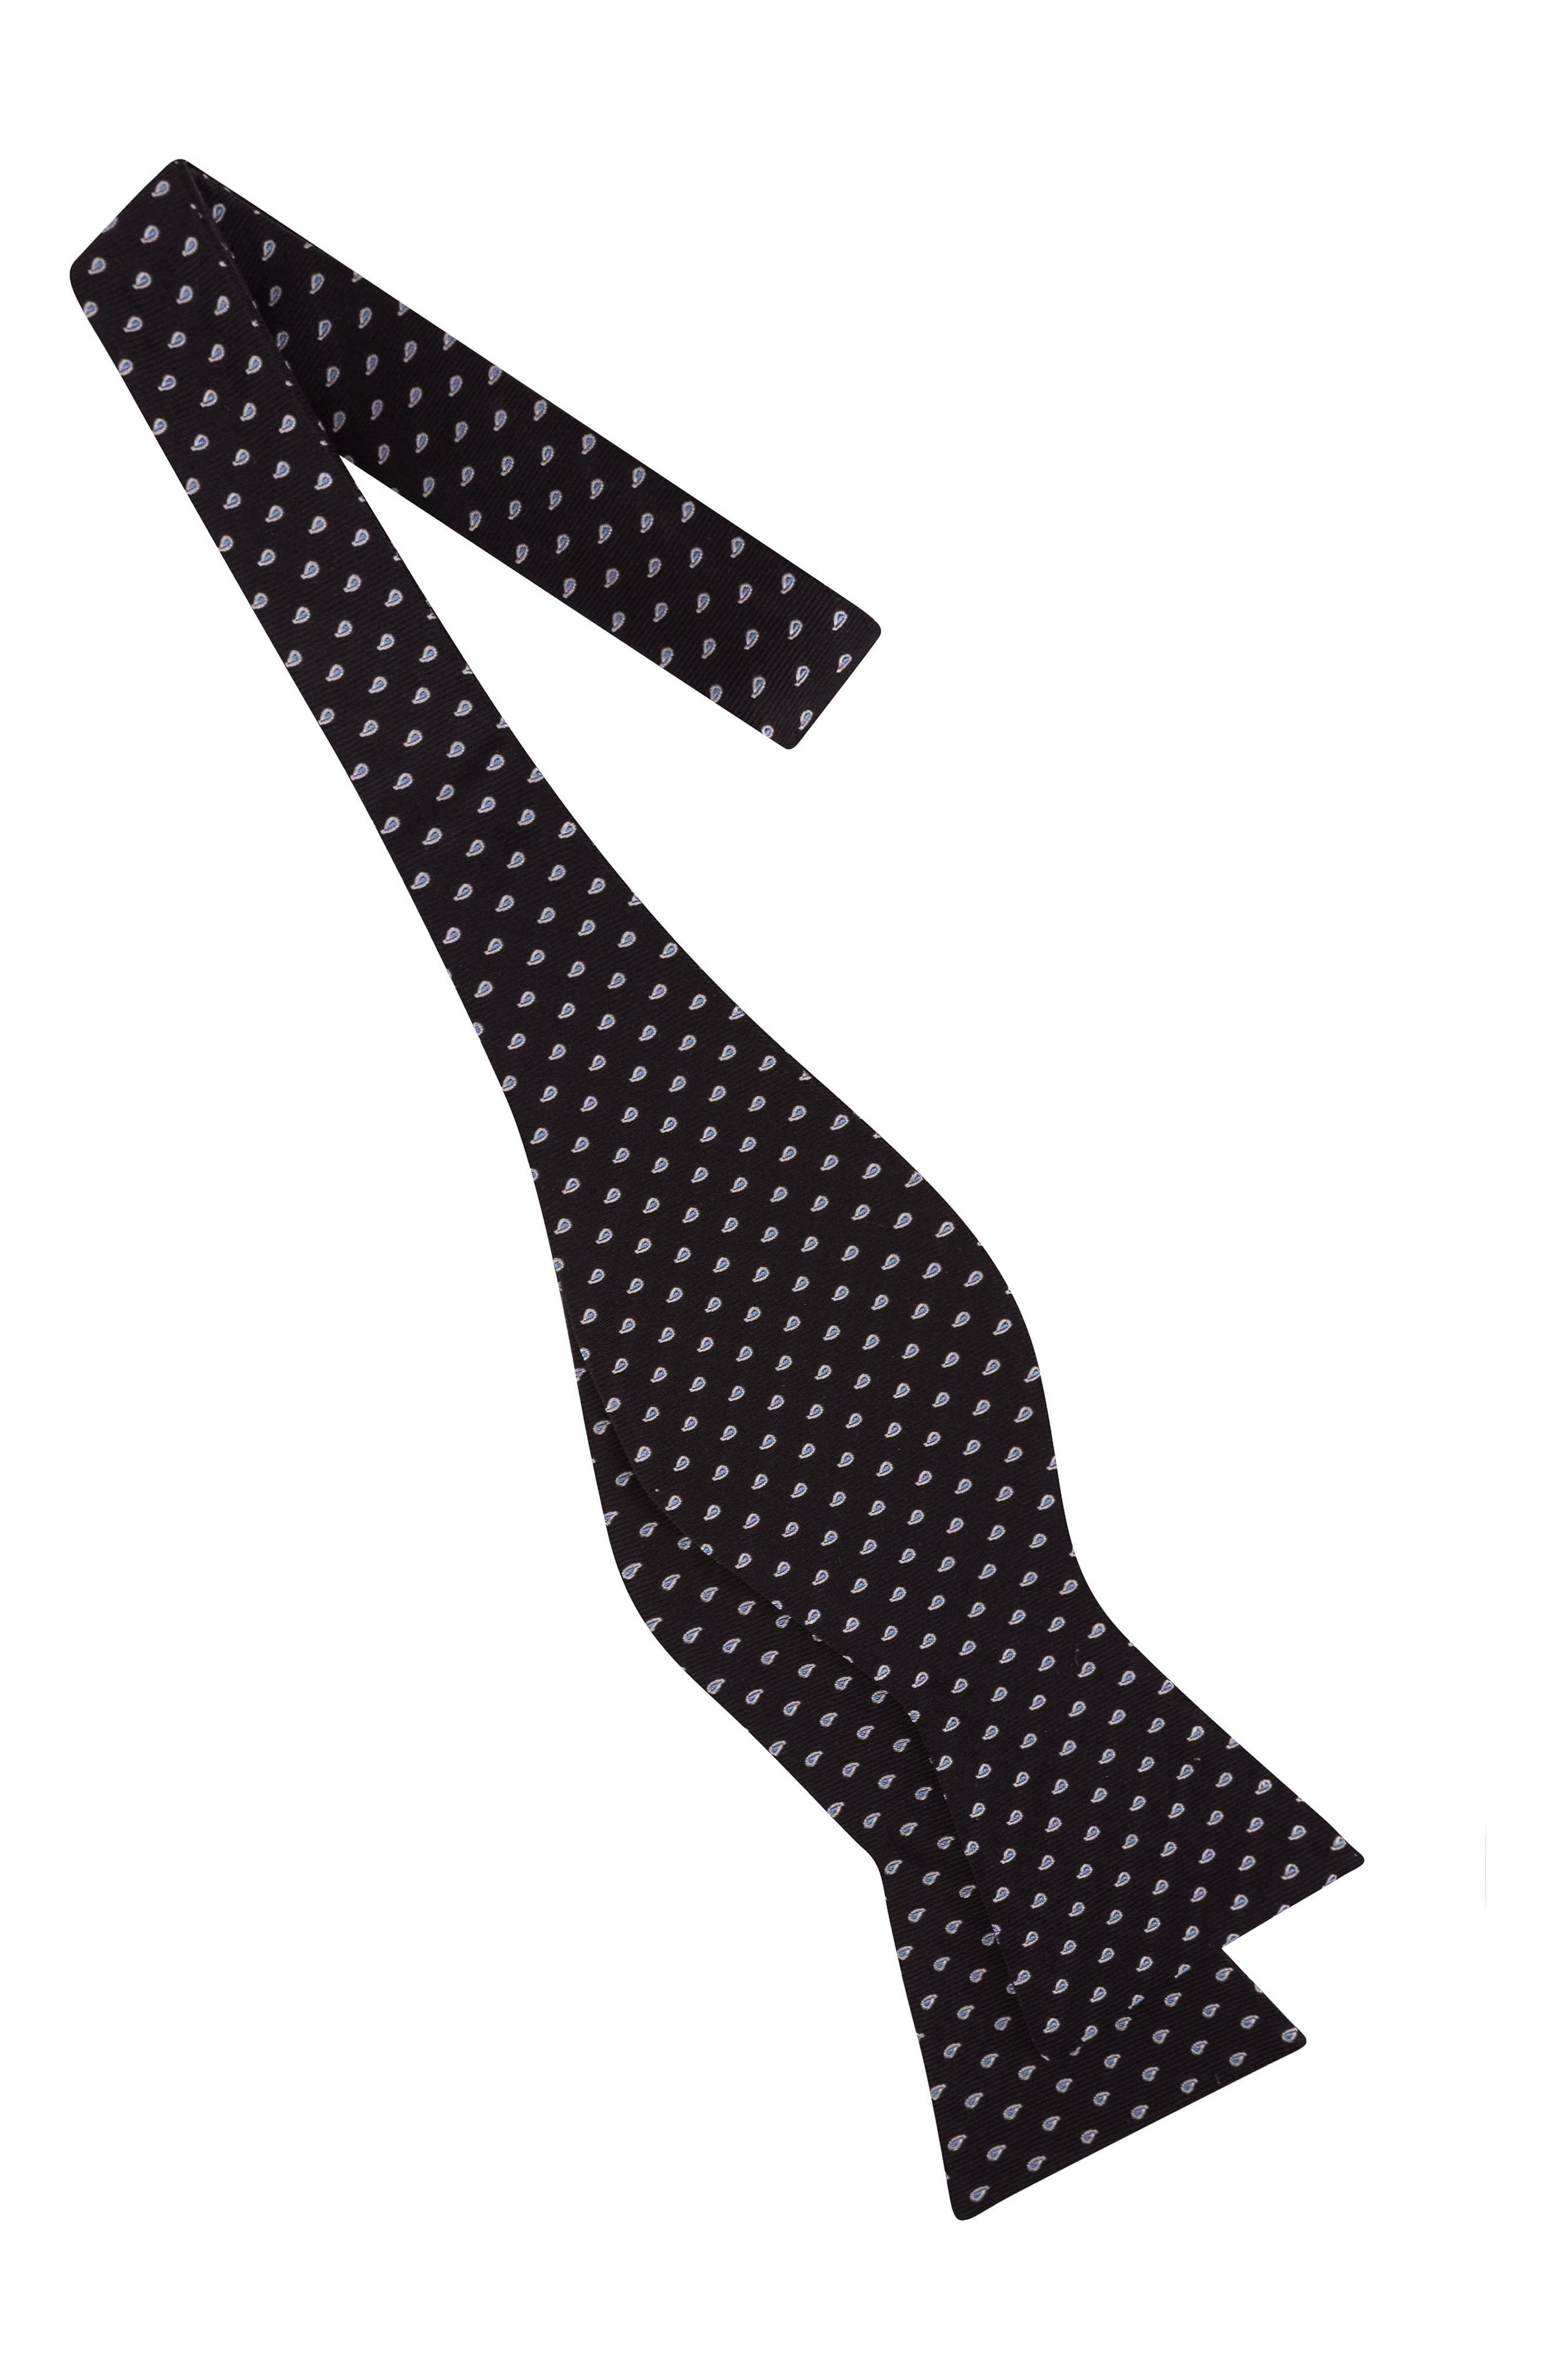 Charming Paisley Silk Bow Tie,                             Alternate thumbnail 2, color,                             001